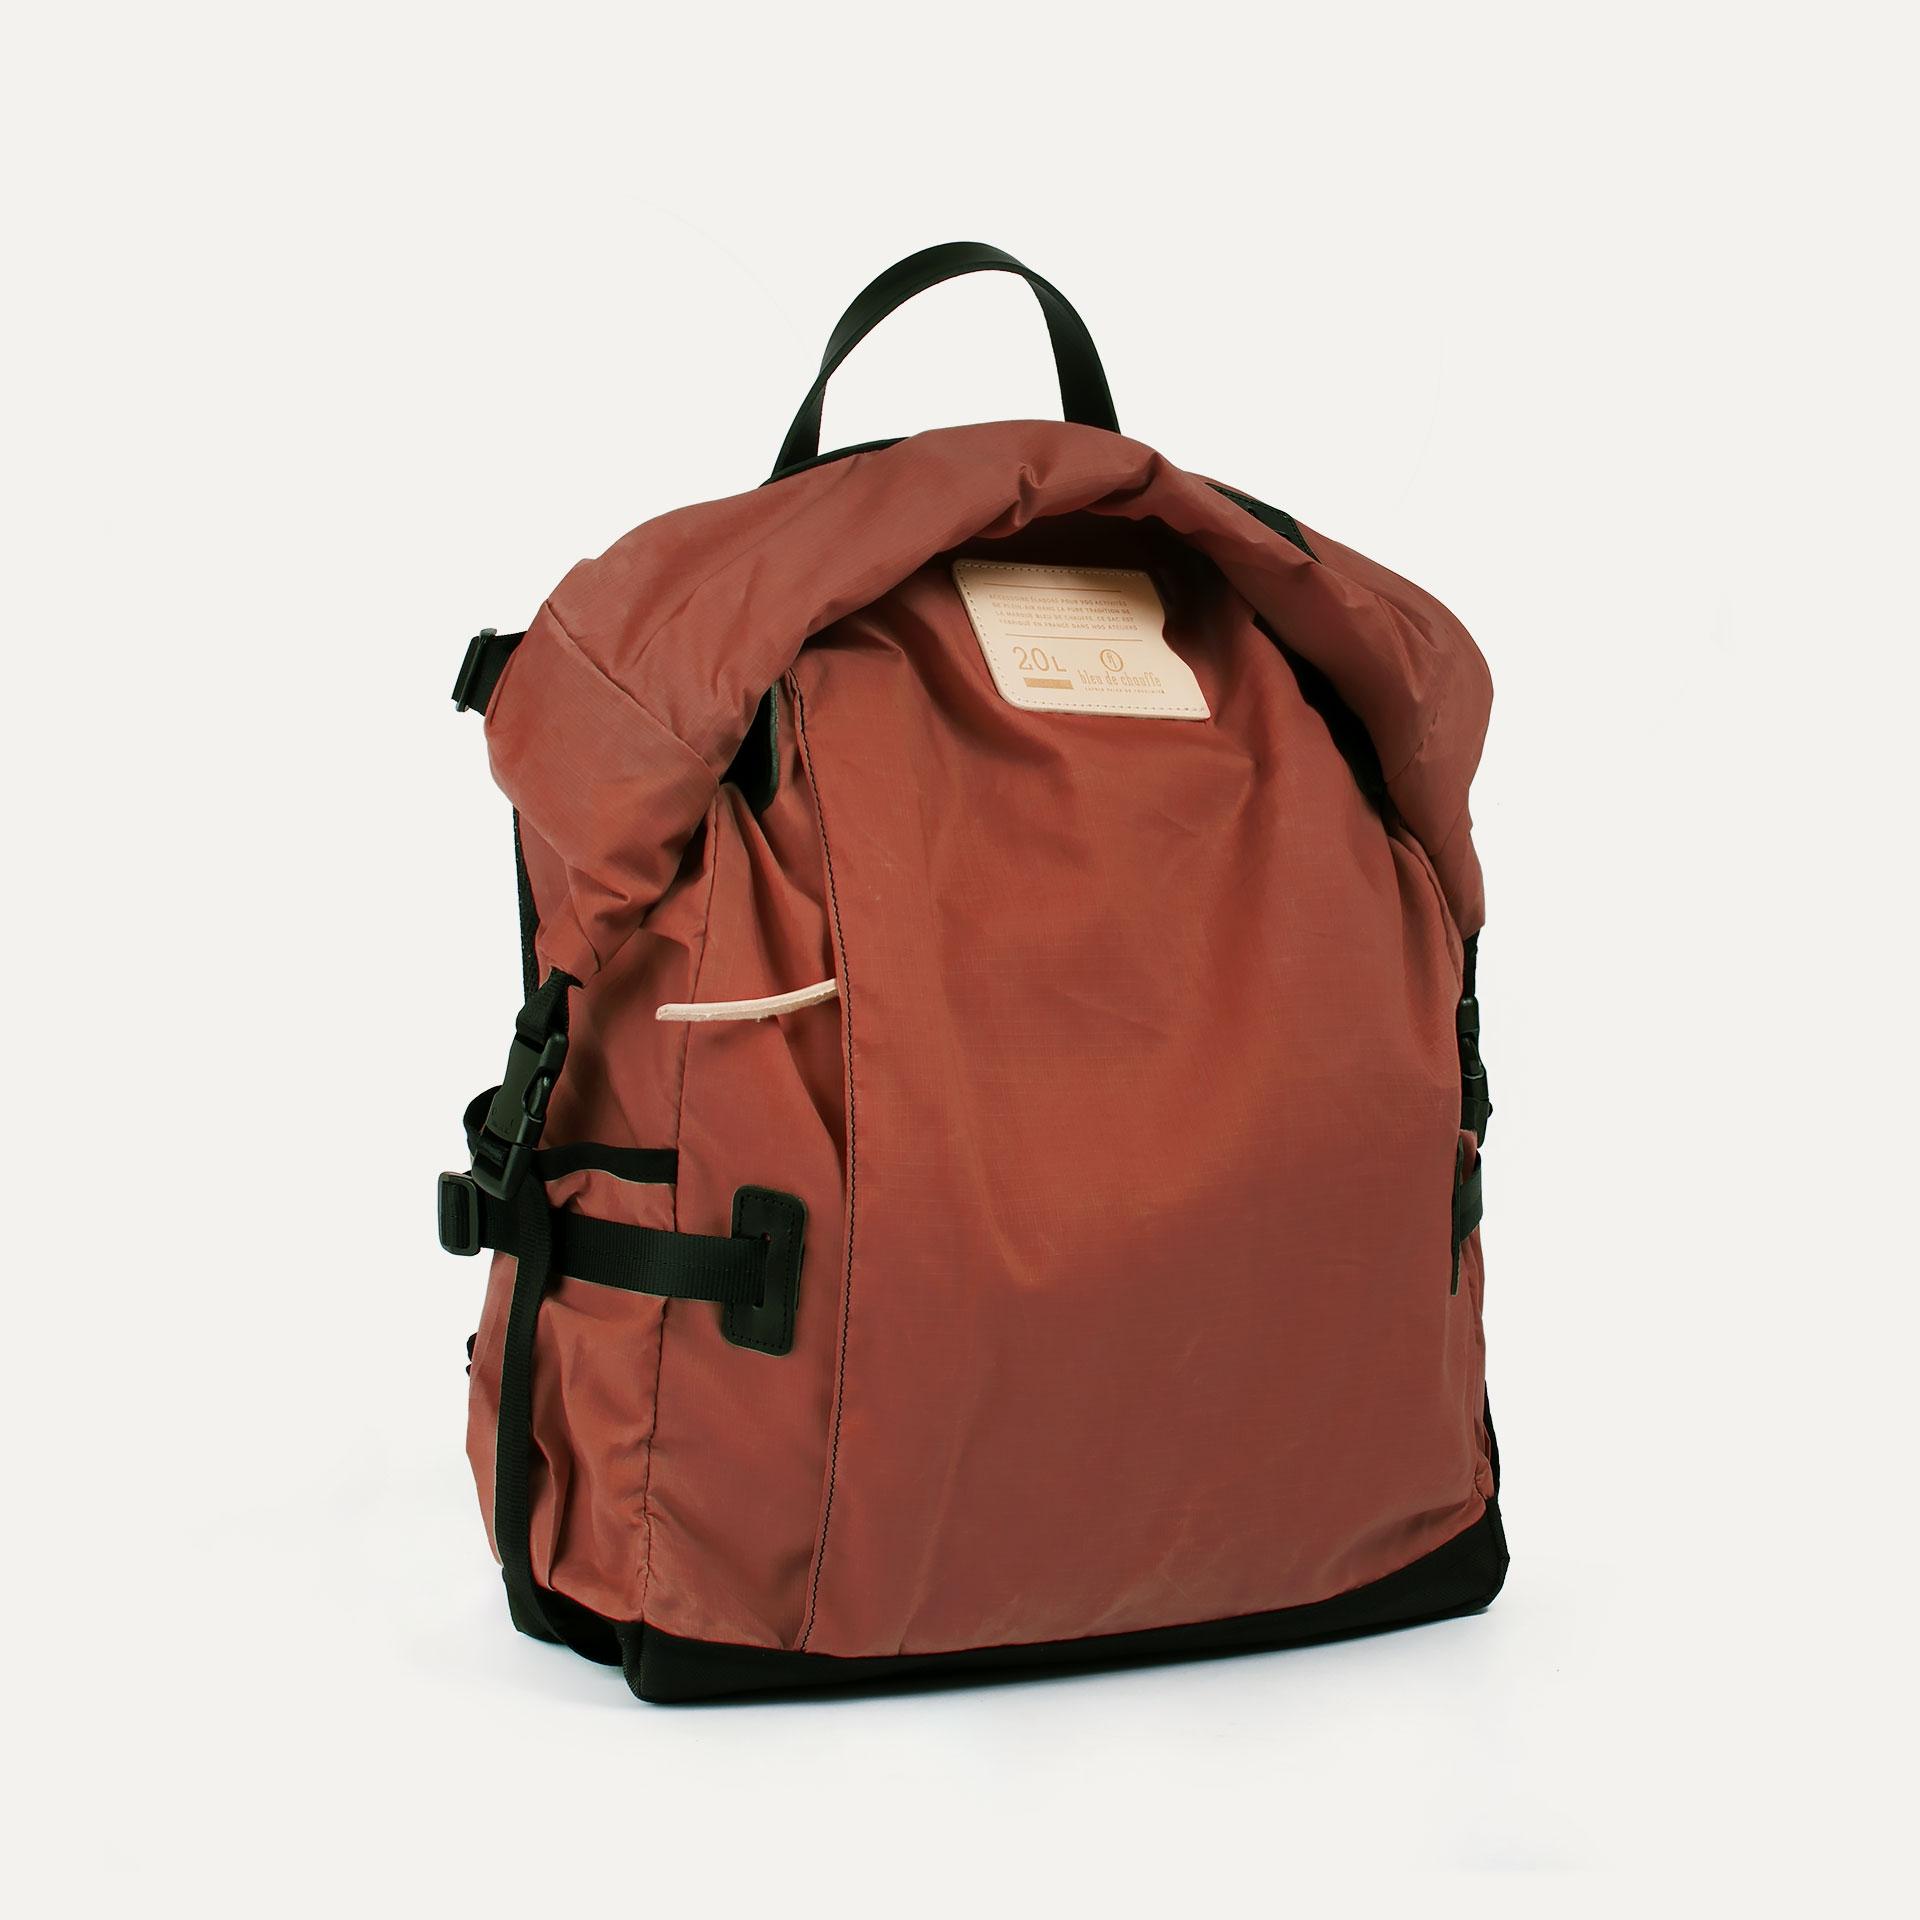 20L Basile Backpack - Burgundy (image n°2)